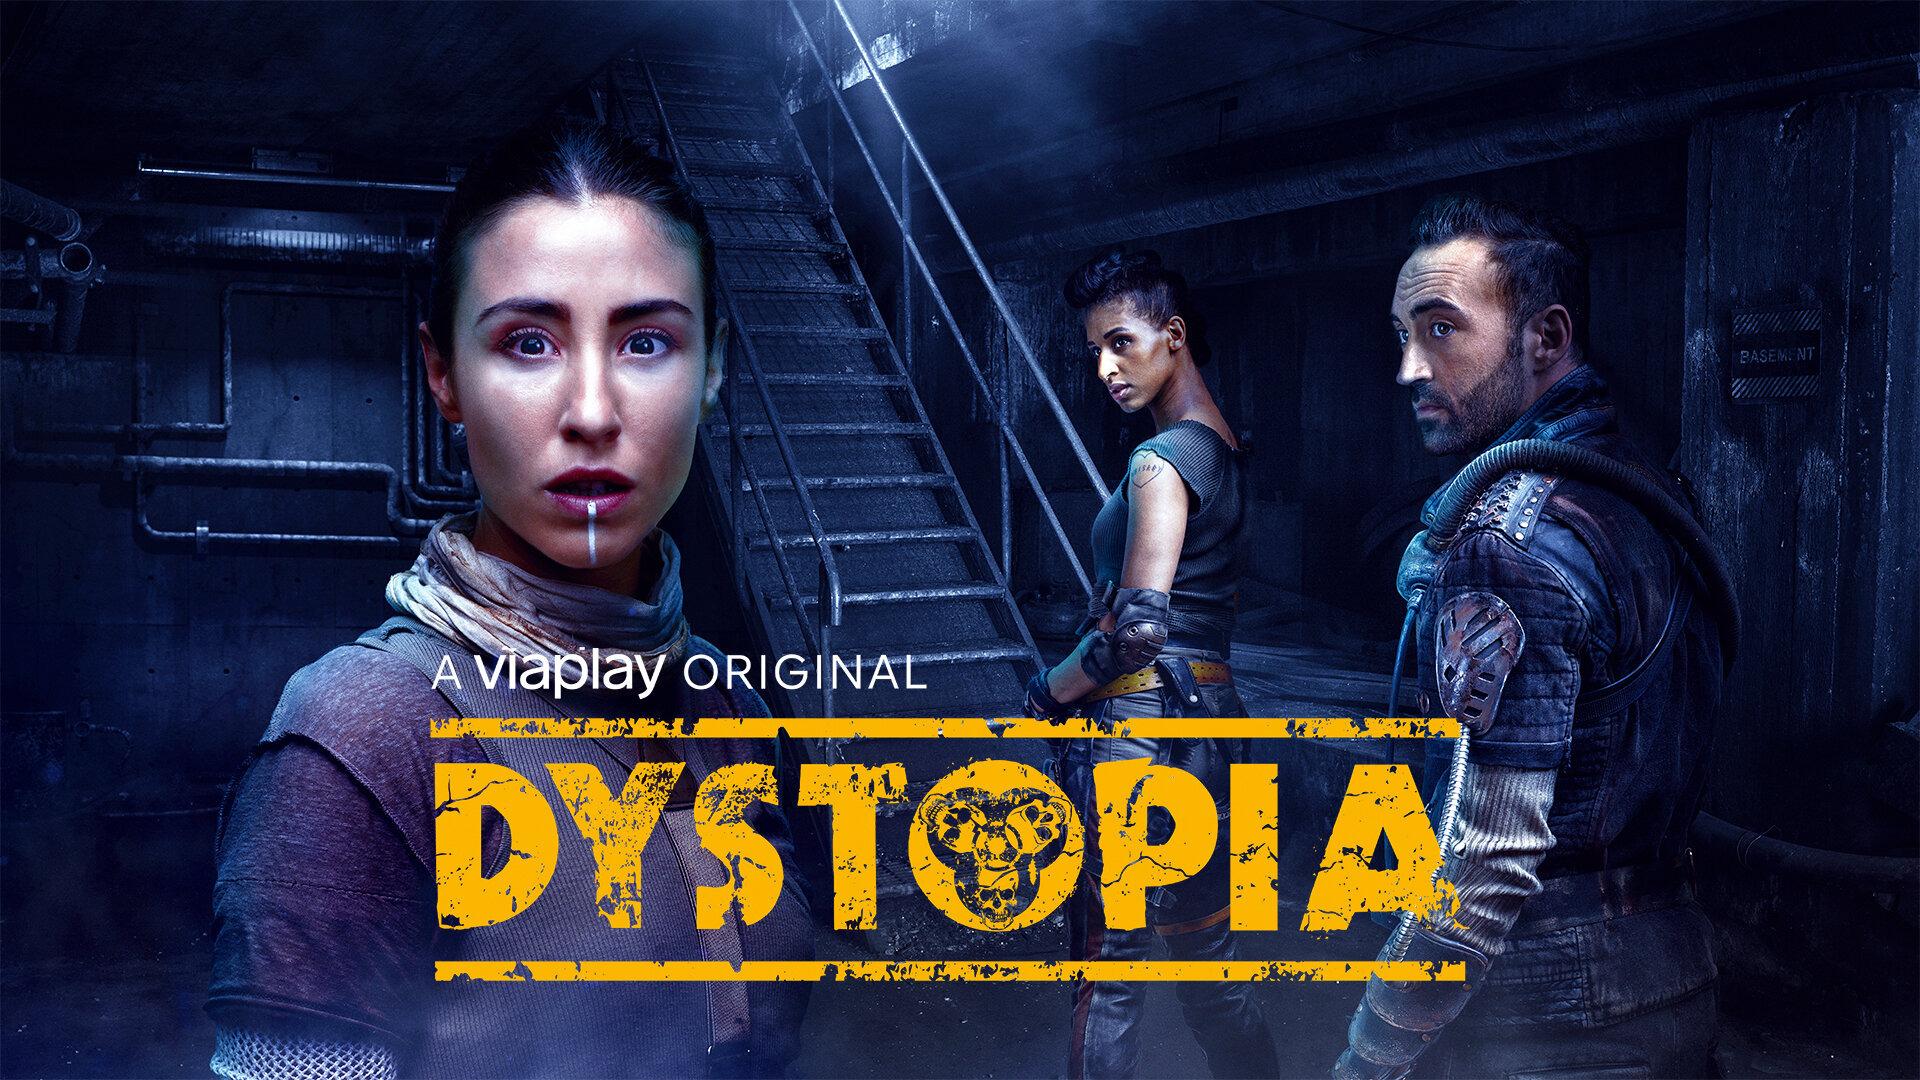 Show Dystopia